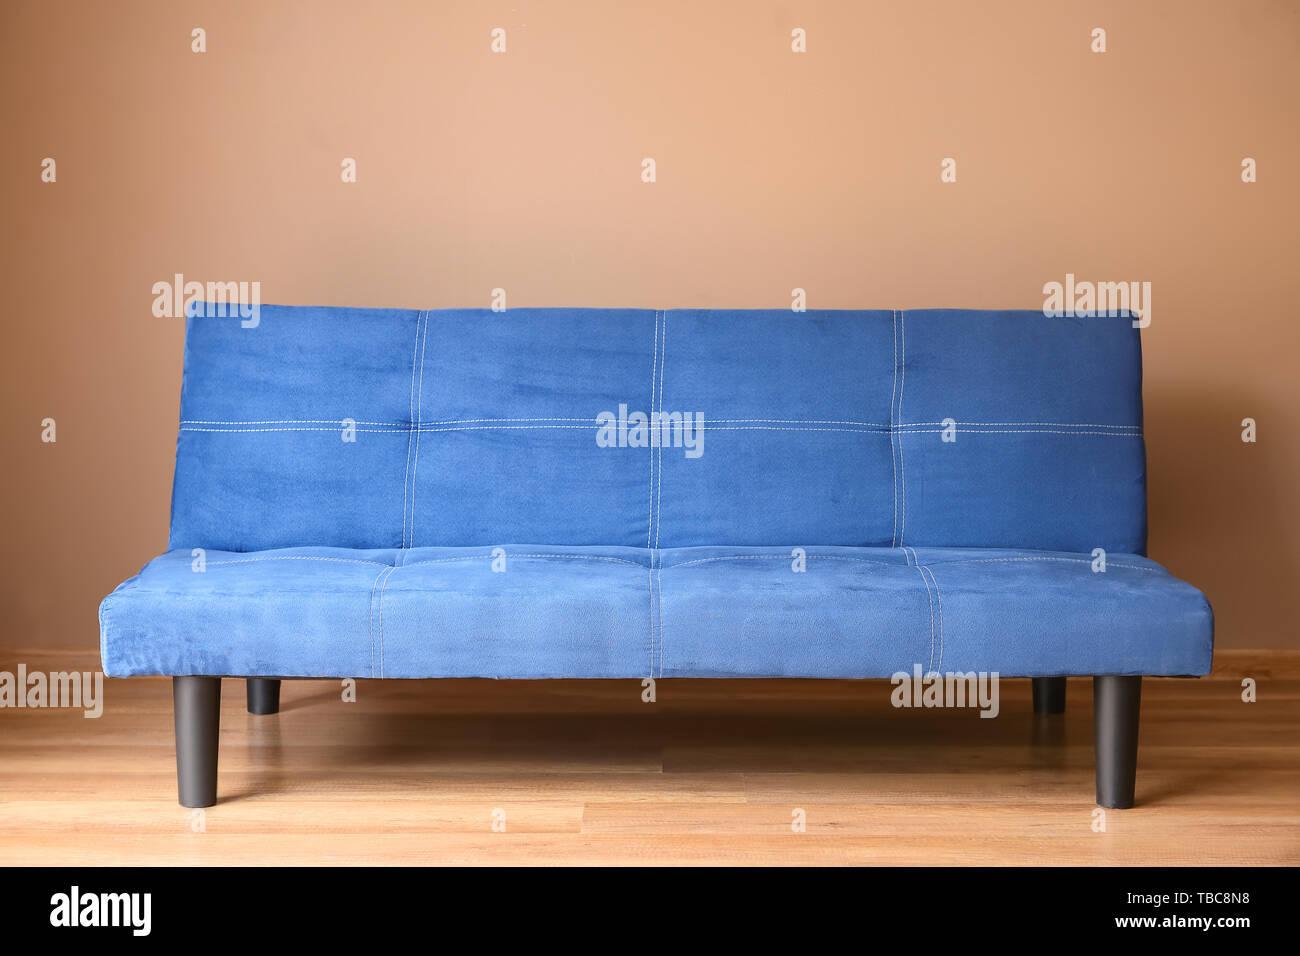 Fantastic Stylish Blue Sofa Near Color Wall In Room Stock Photo Uwap Interior Chair Design Uwaporg